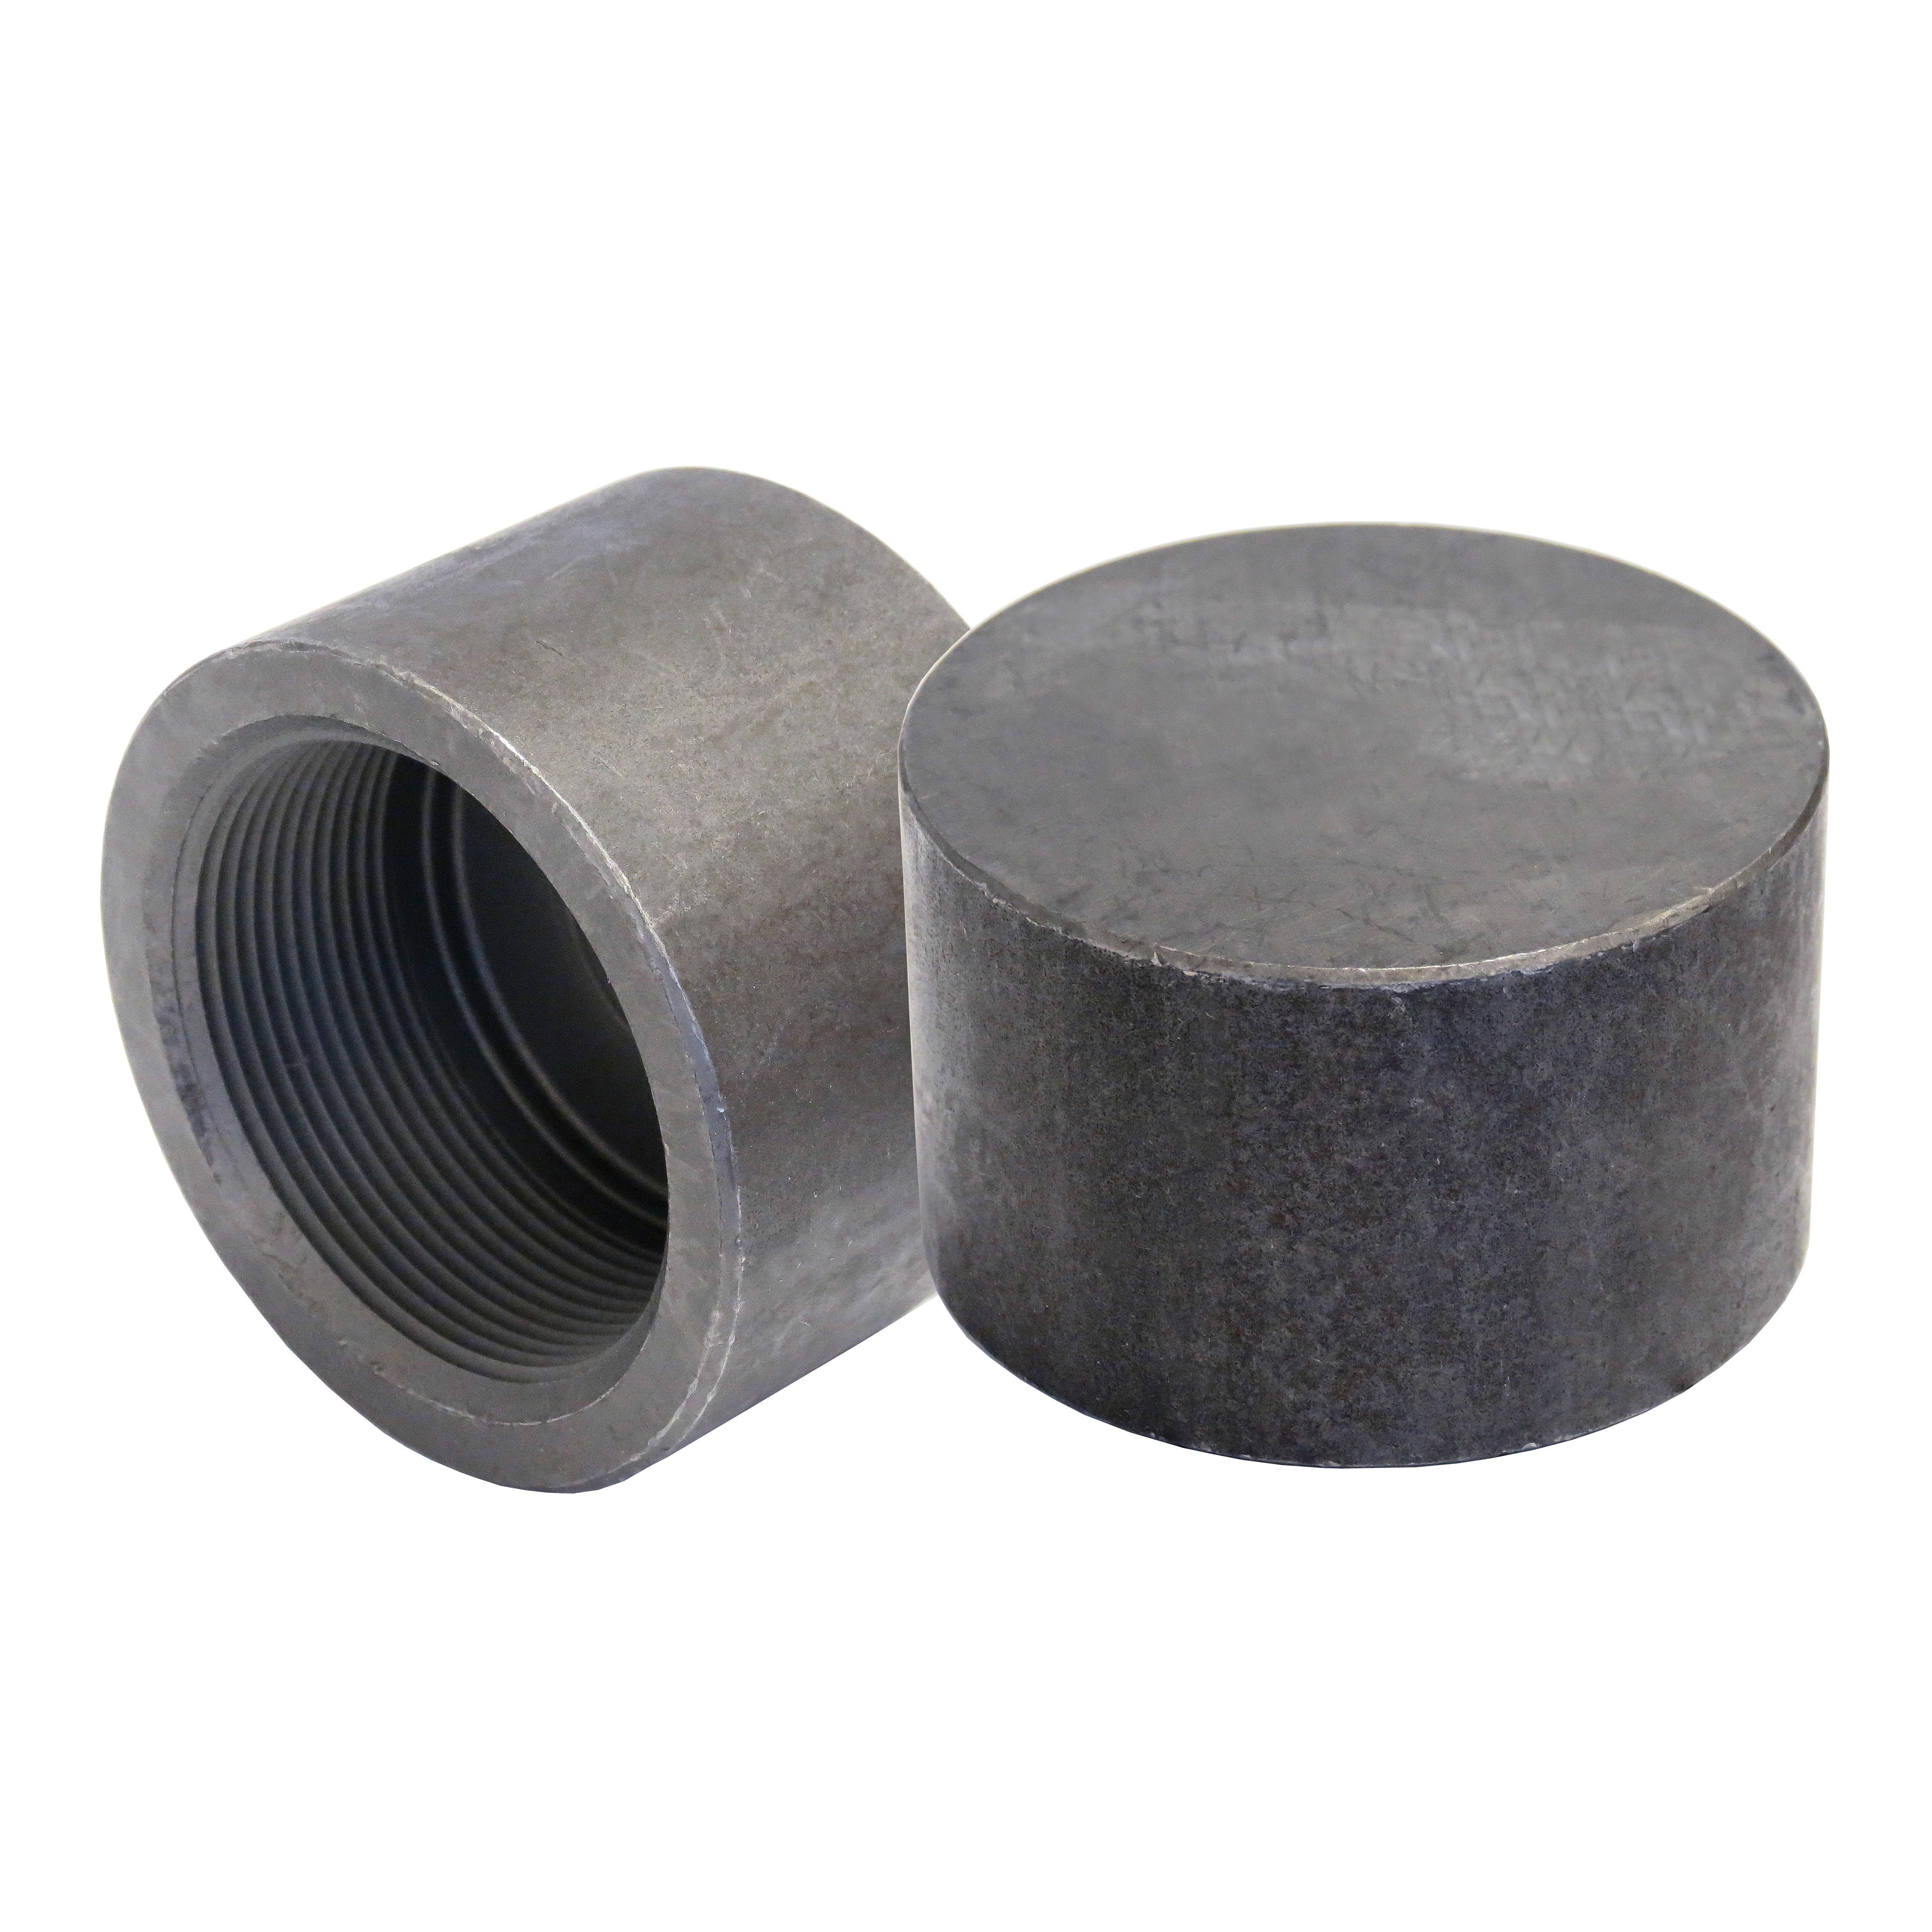 Anvil® 0361189608 FIG 2120 Pipe Cap, 2 in Nominal, FNPT End Style, 3000 lb, Steel, Black Oxide, Domestic